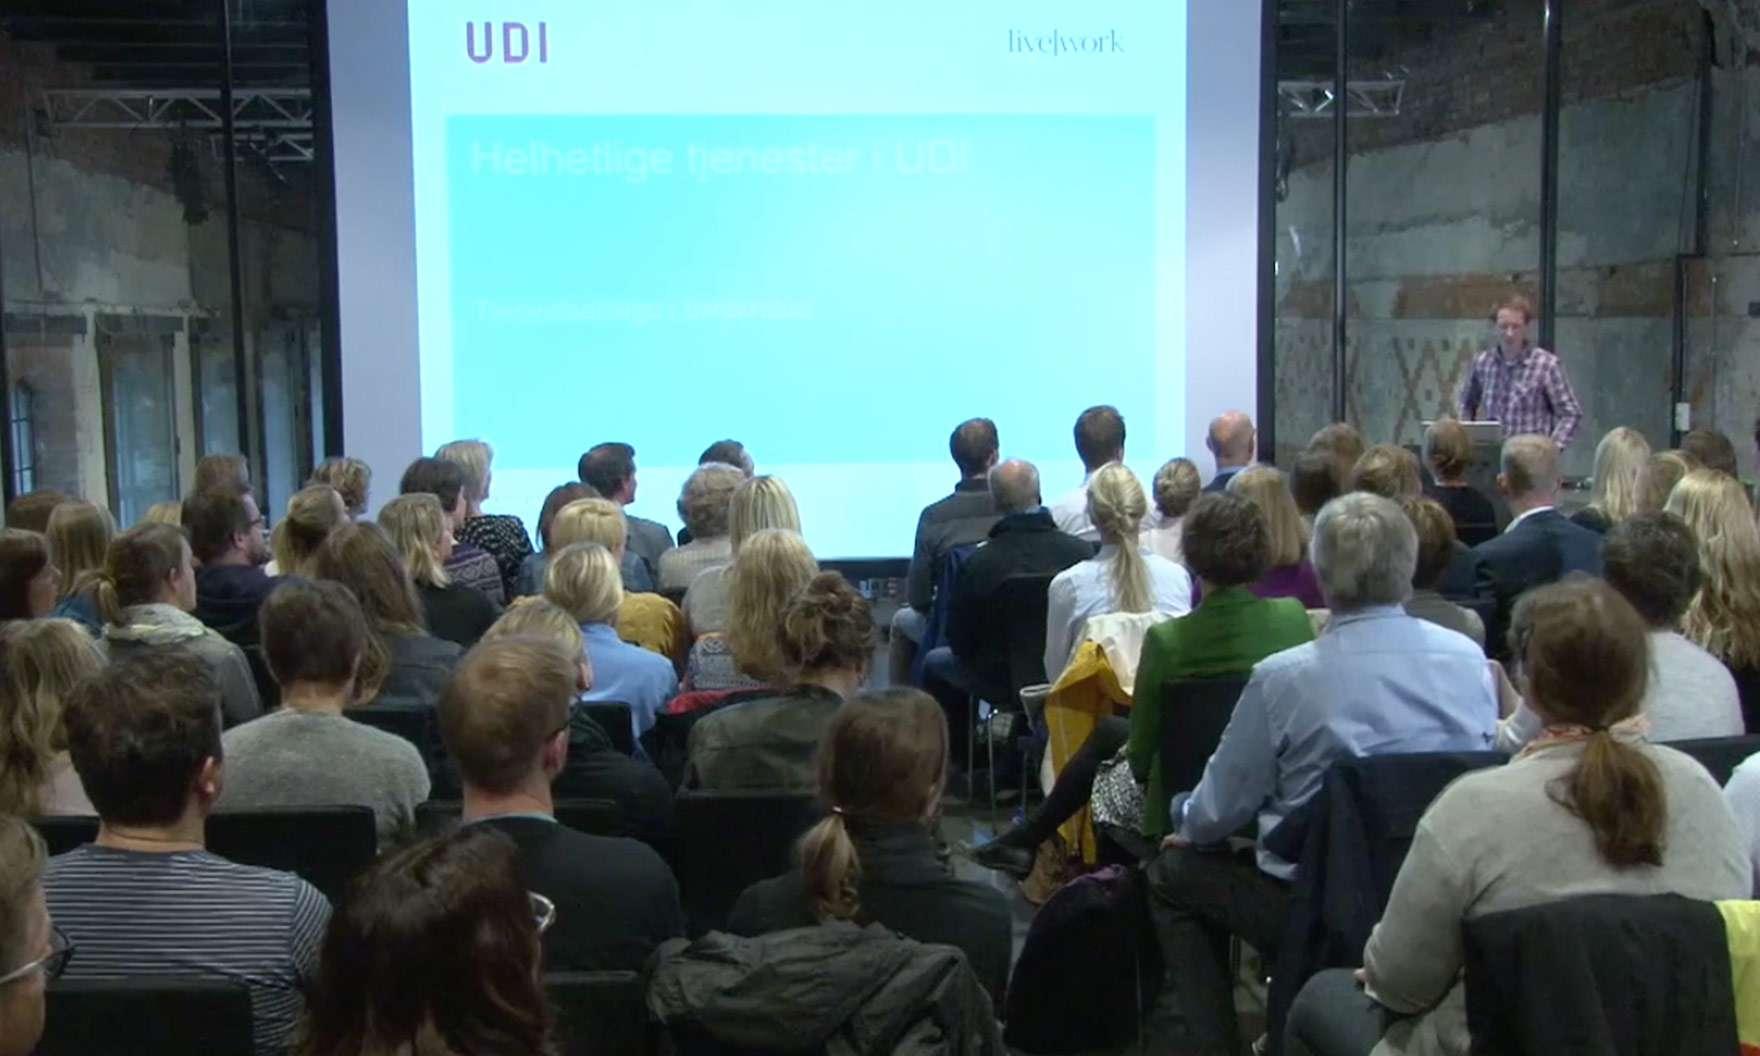 Helhetlige tjenester i UDI - tjenestedesign i byråkratiet